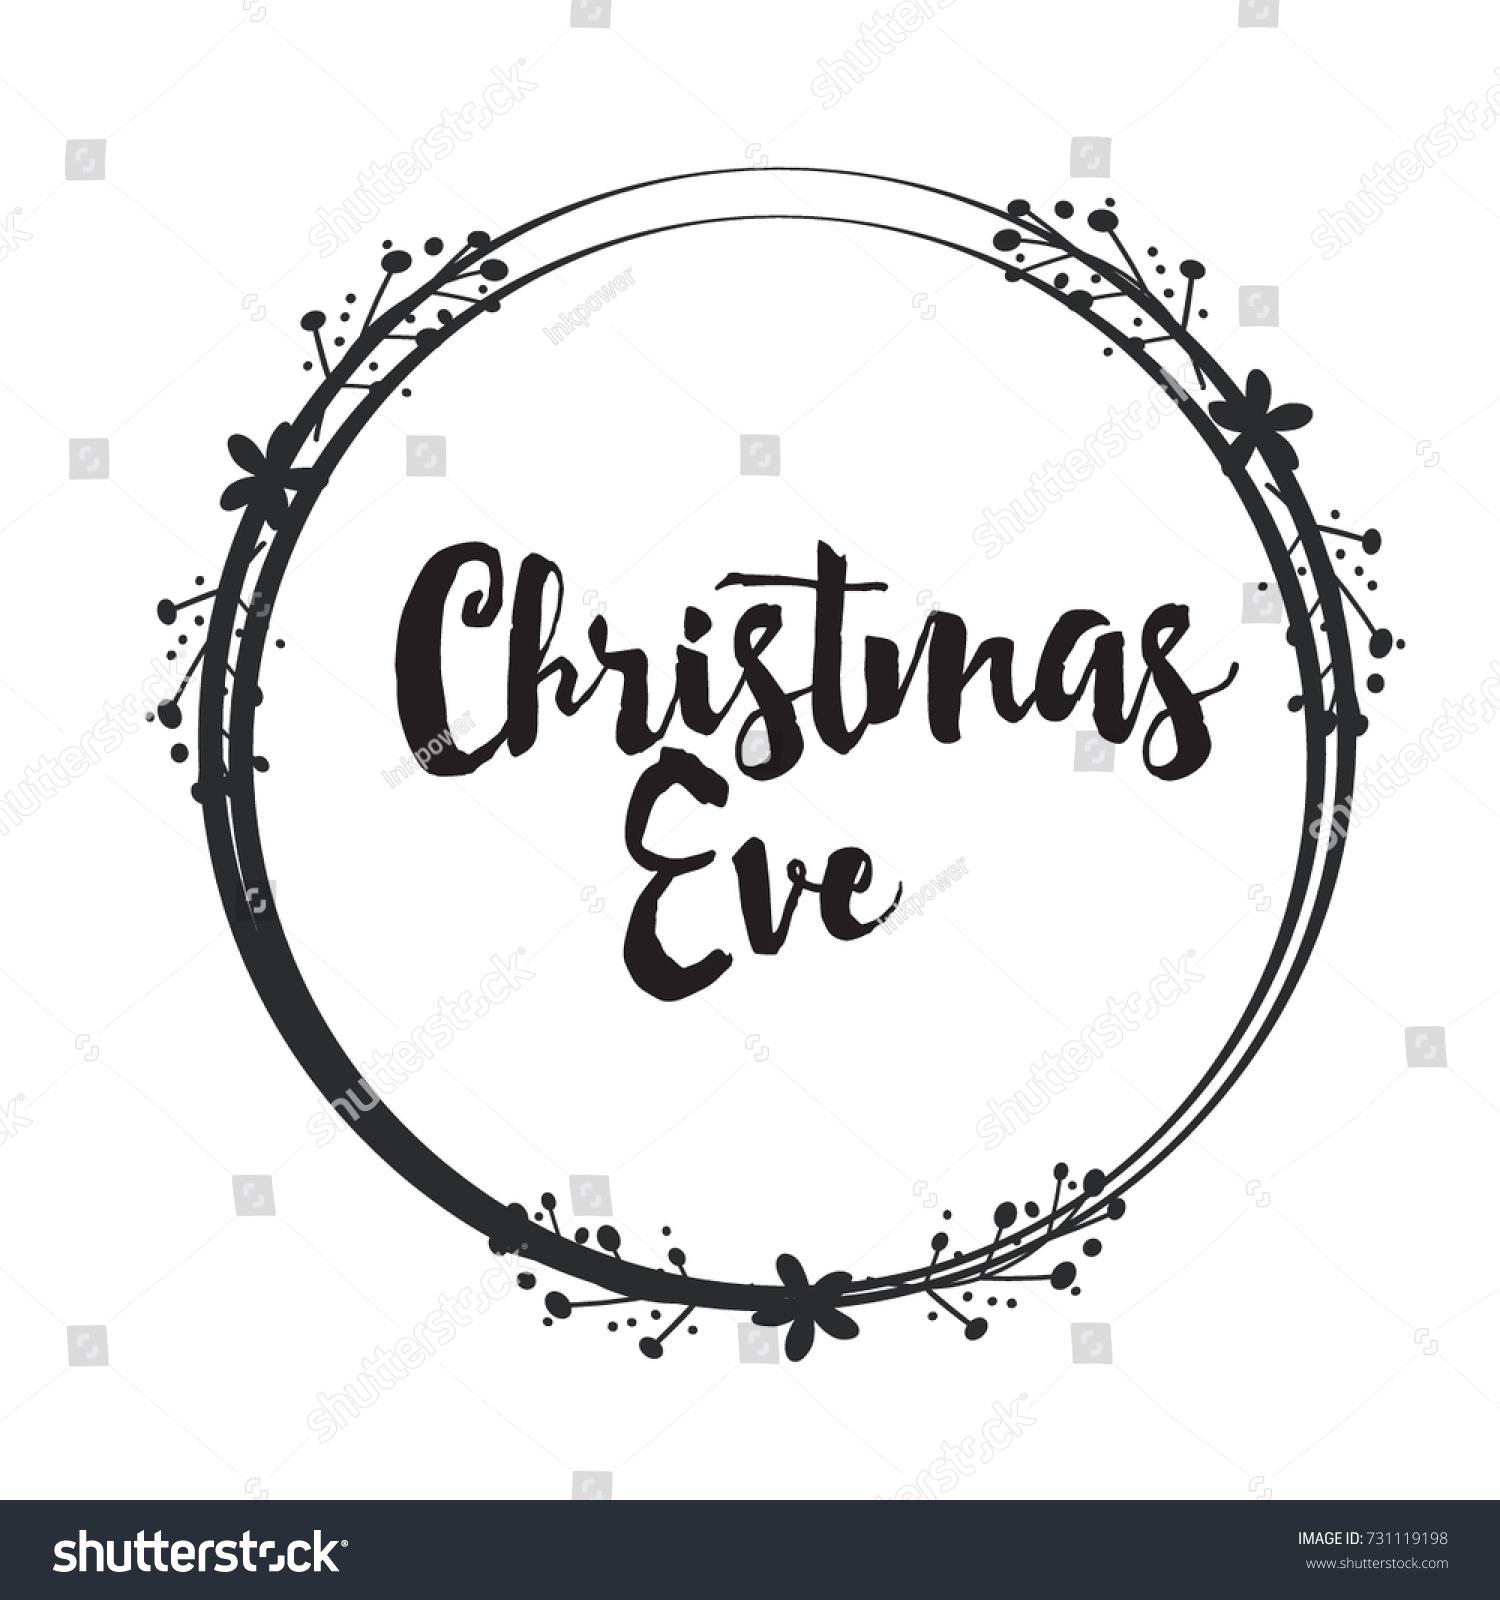 Christmas Word Art Design Floral Circle Stock Vector (Royalty Free ...